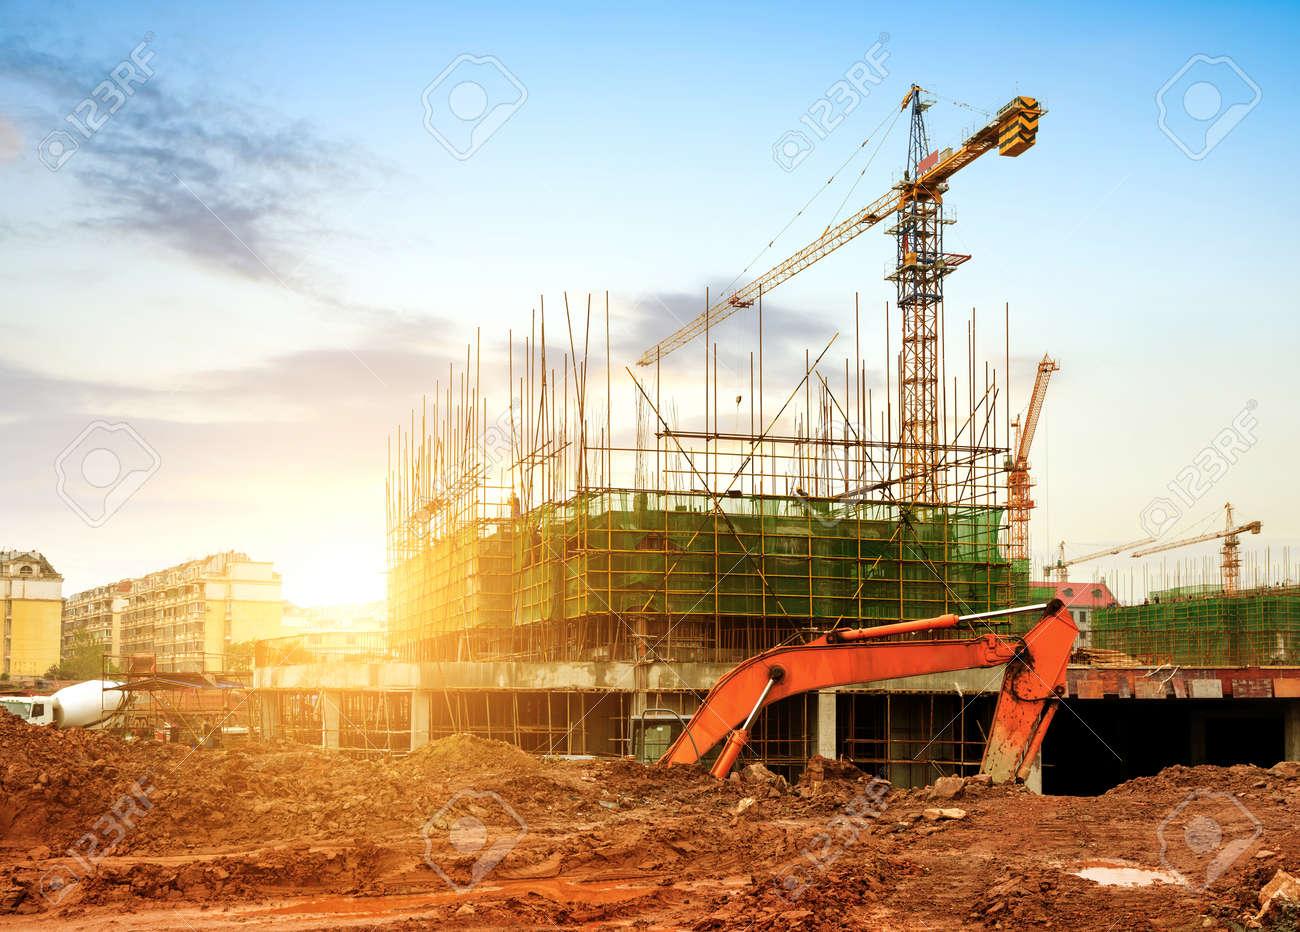 Construction site, workers and cranes. Standard-Bild - 37339383